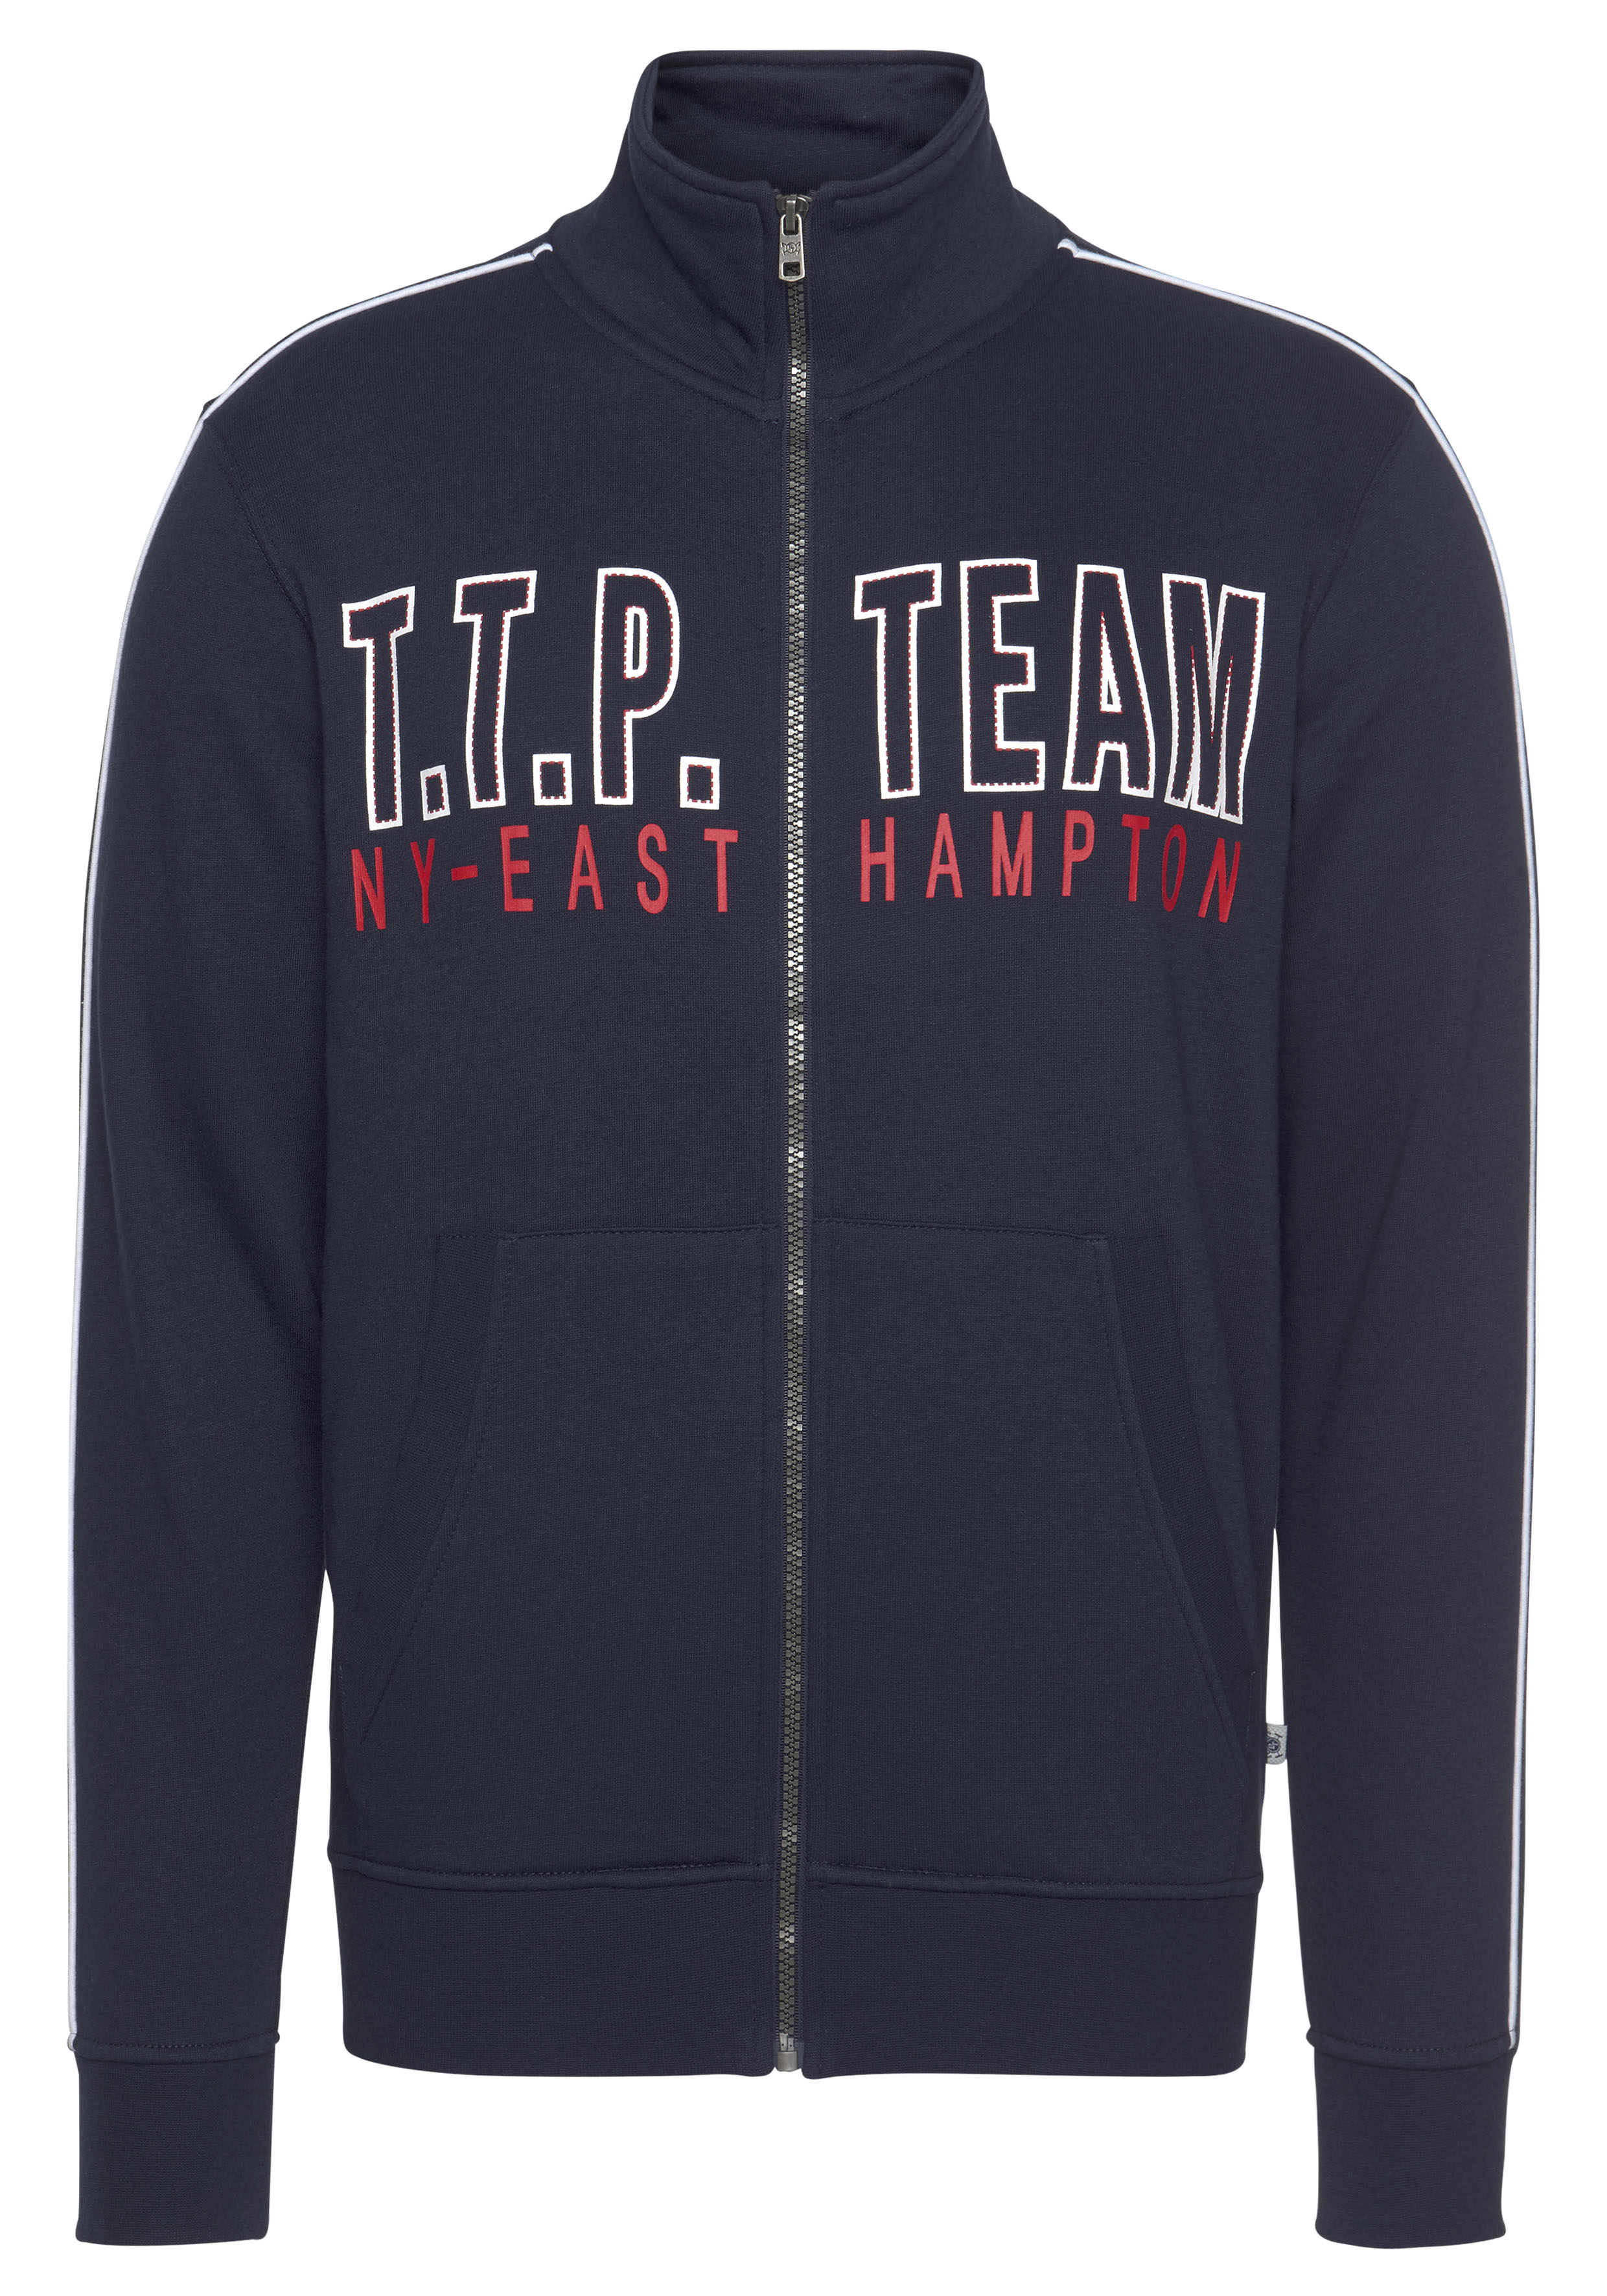 TOM TAILOR Polo Team Sweatjacke | Bekleidung > Sweatshirts & -jacken > Sweatjacken | Tom Tailor Polo Team